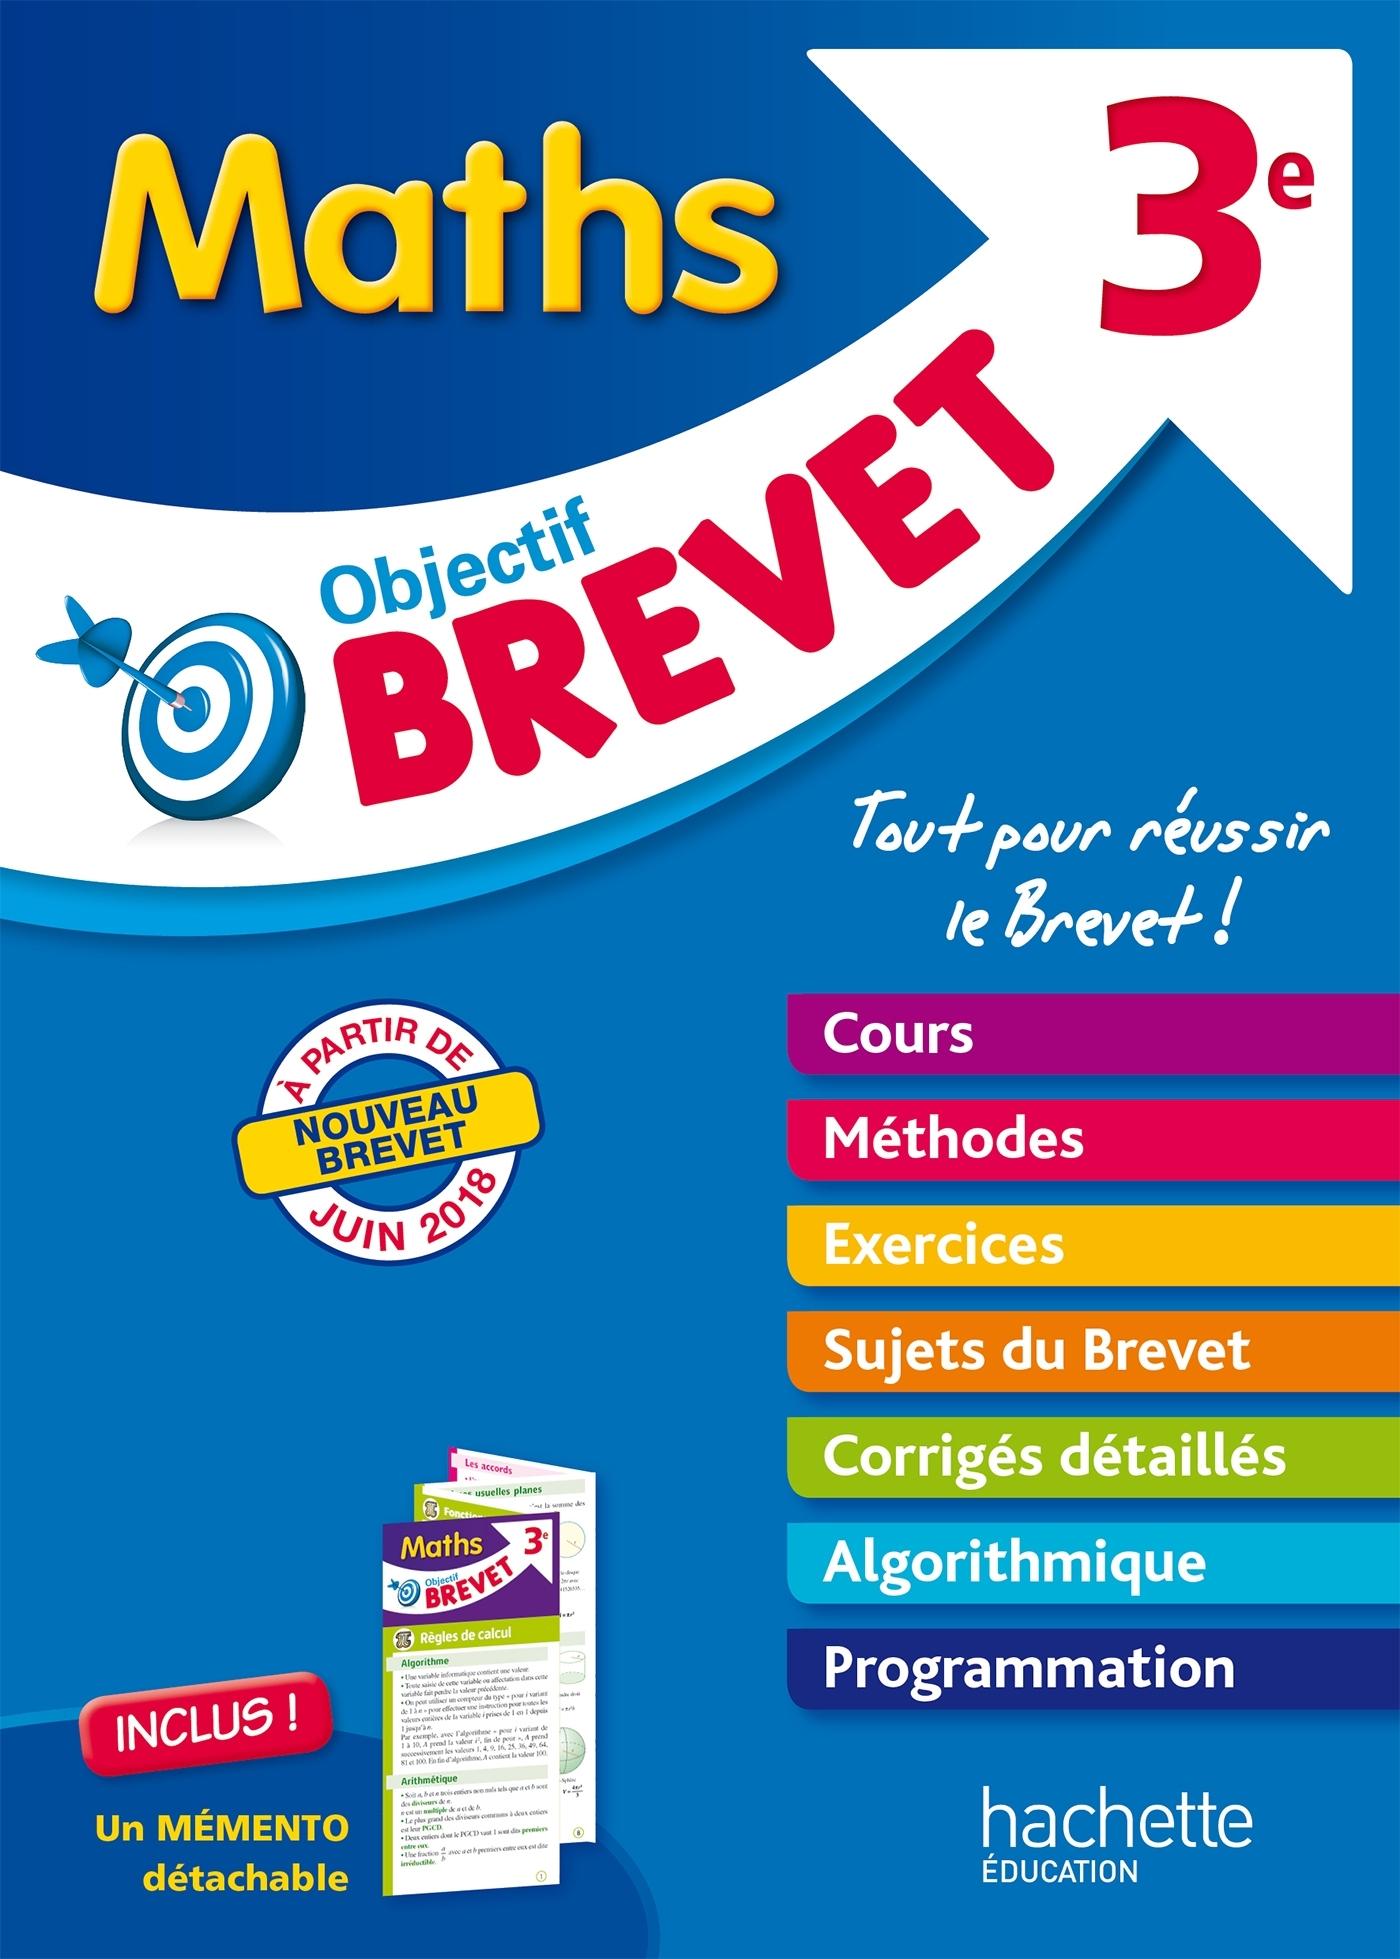 OBJECTIF BREVET - L'EPREUVE DE MATHS